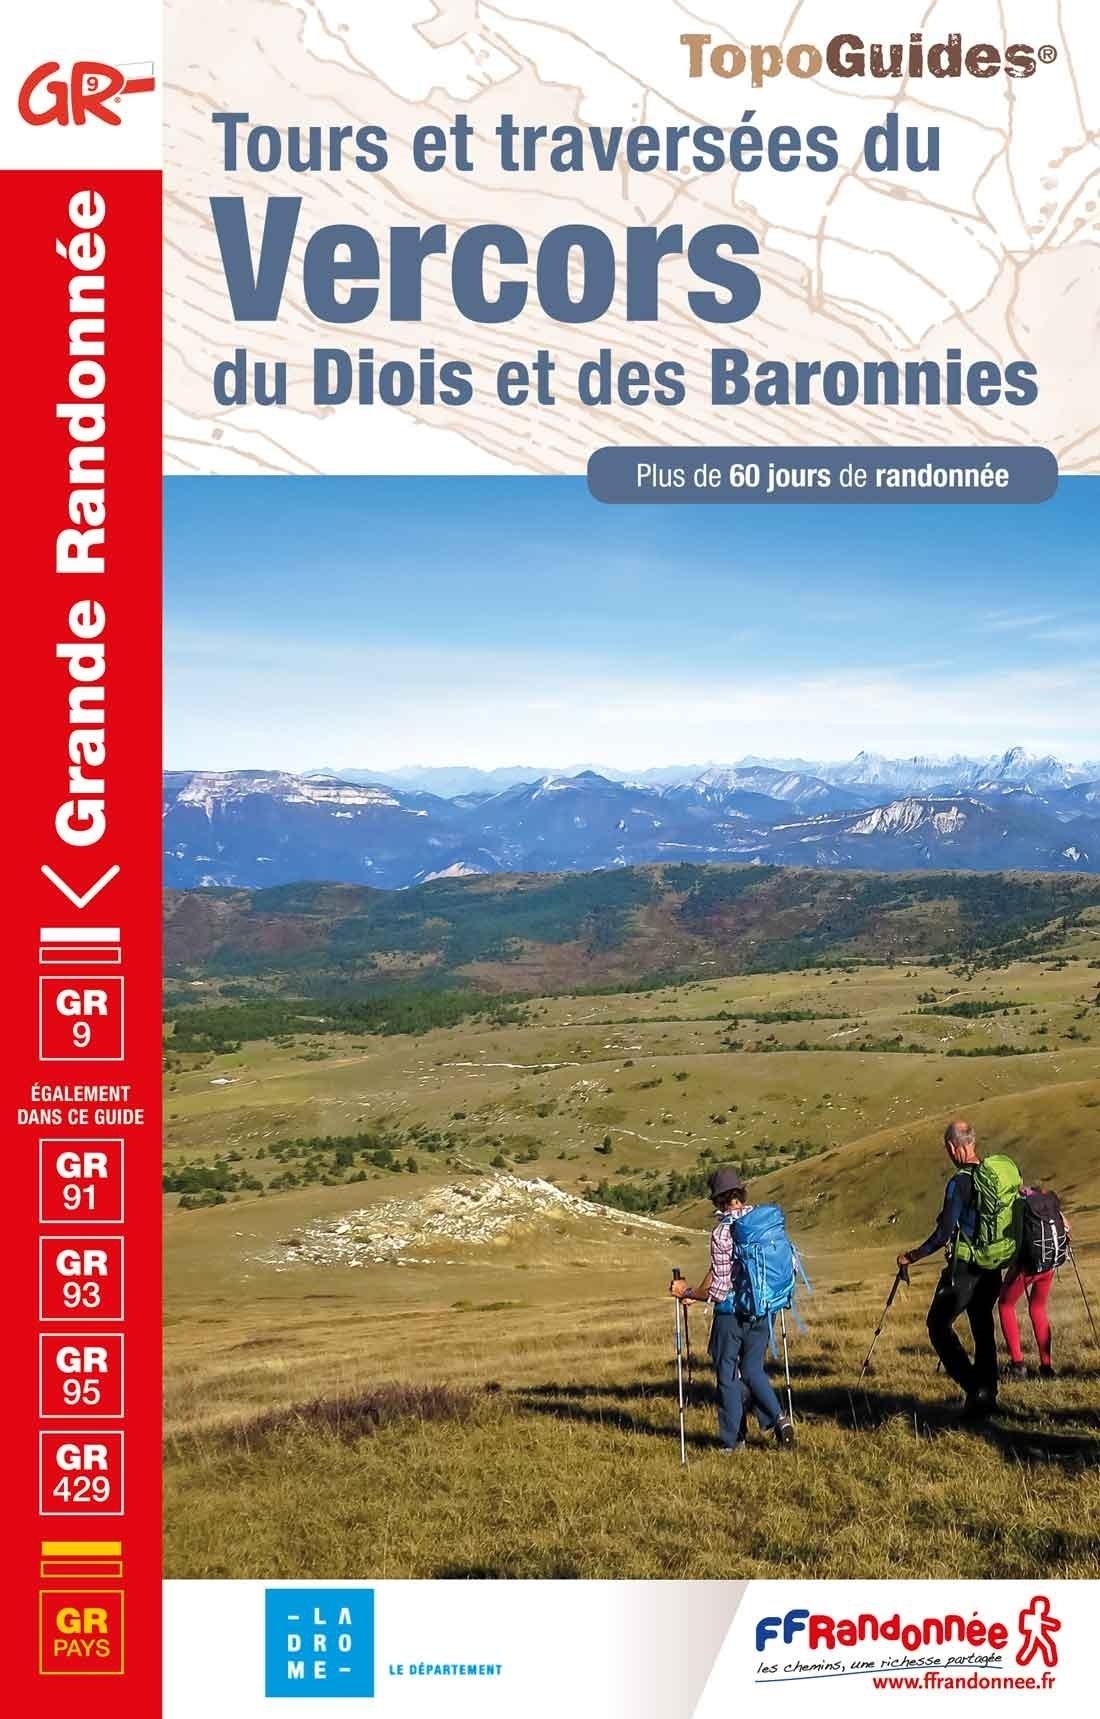 TG-904  Vercors, Diois, Baronnies; GR9 9782751403910  FFRP topoguides à grande randonnée  Meerdaagse wandelroutes, Wandelgidsen Ardèche, Drôme, Franse Alpen: noord